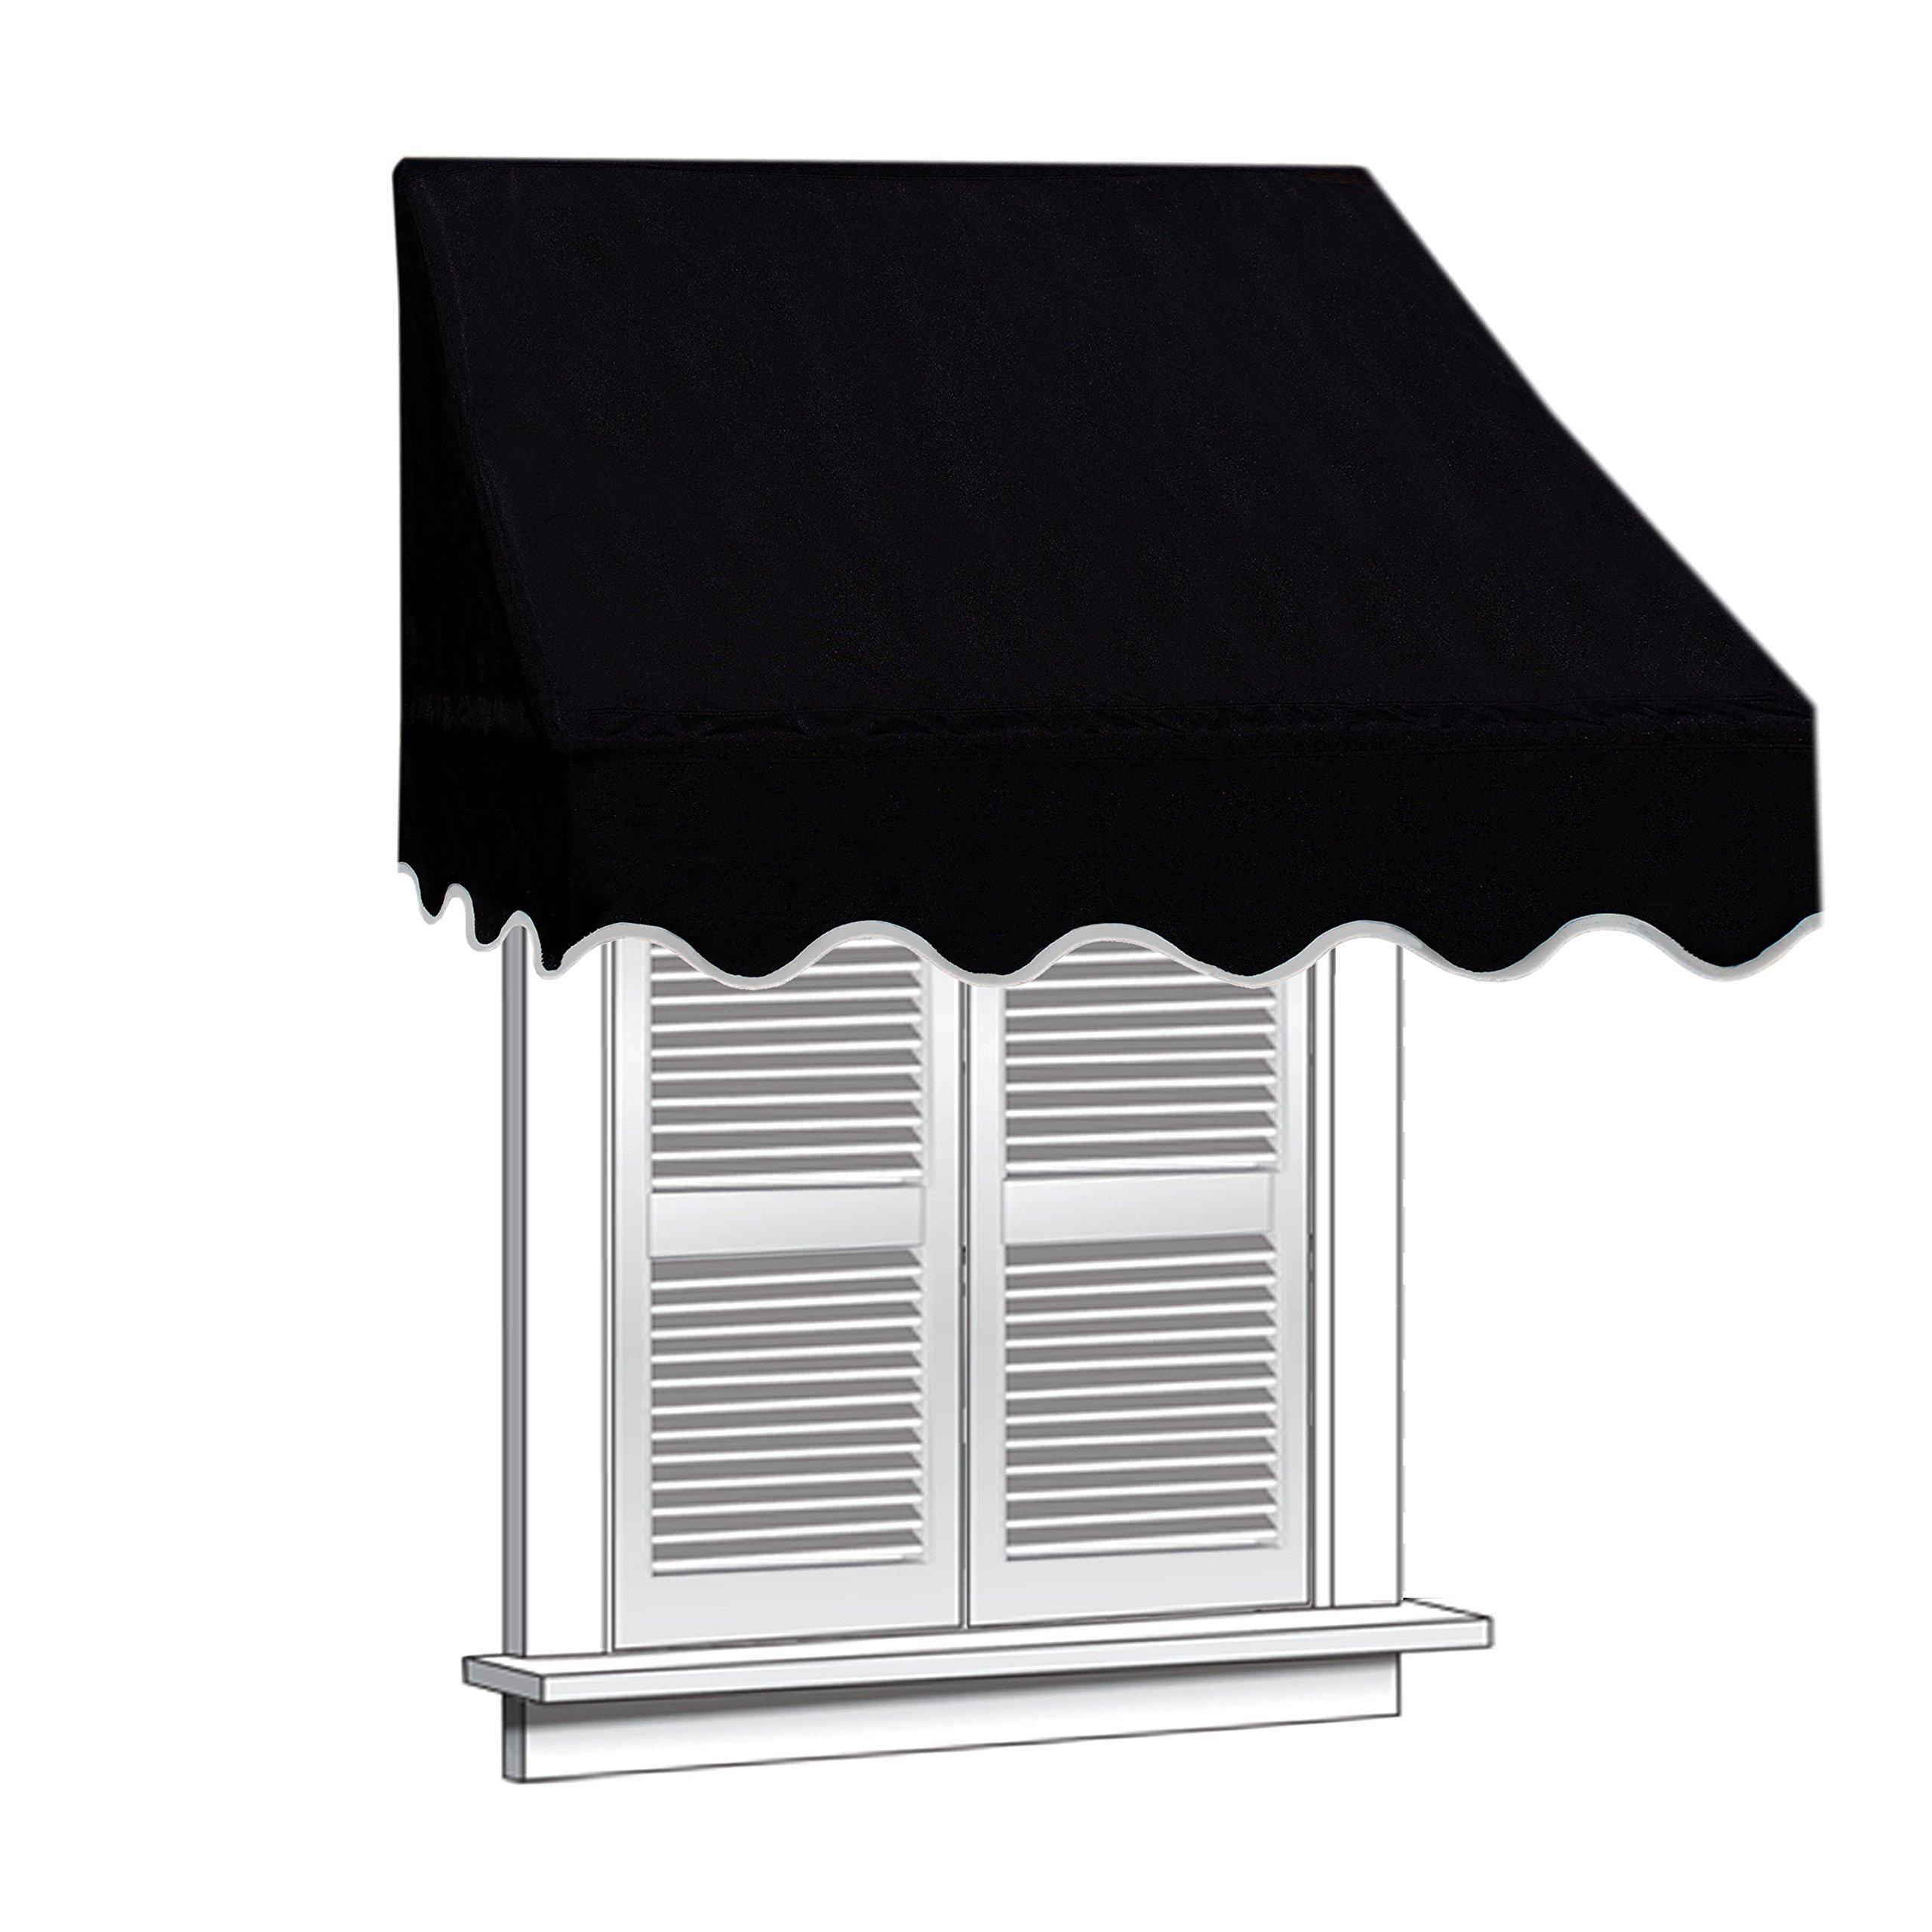 ALEKO 6x2 Black Window Awning Door Canopy 6-Foot Decorator Awning by ALEKO